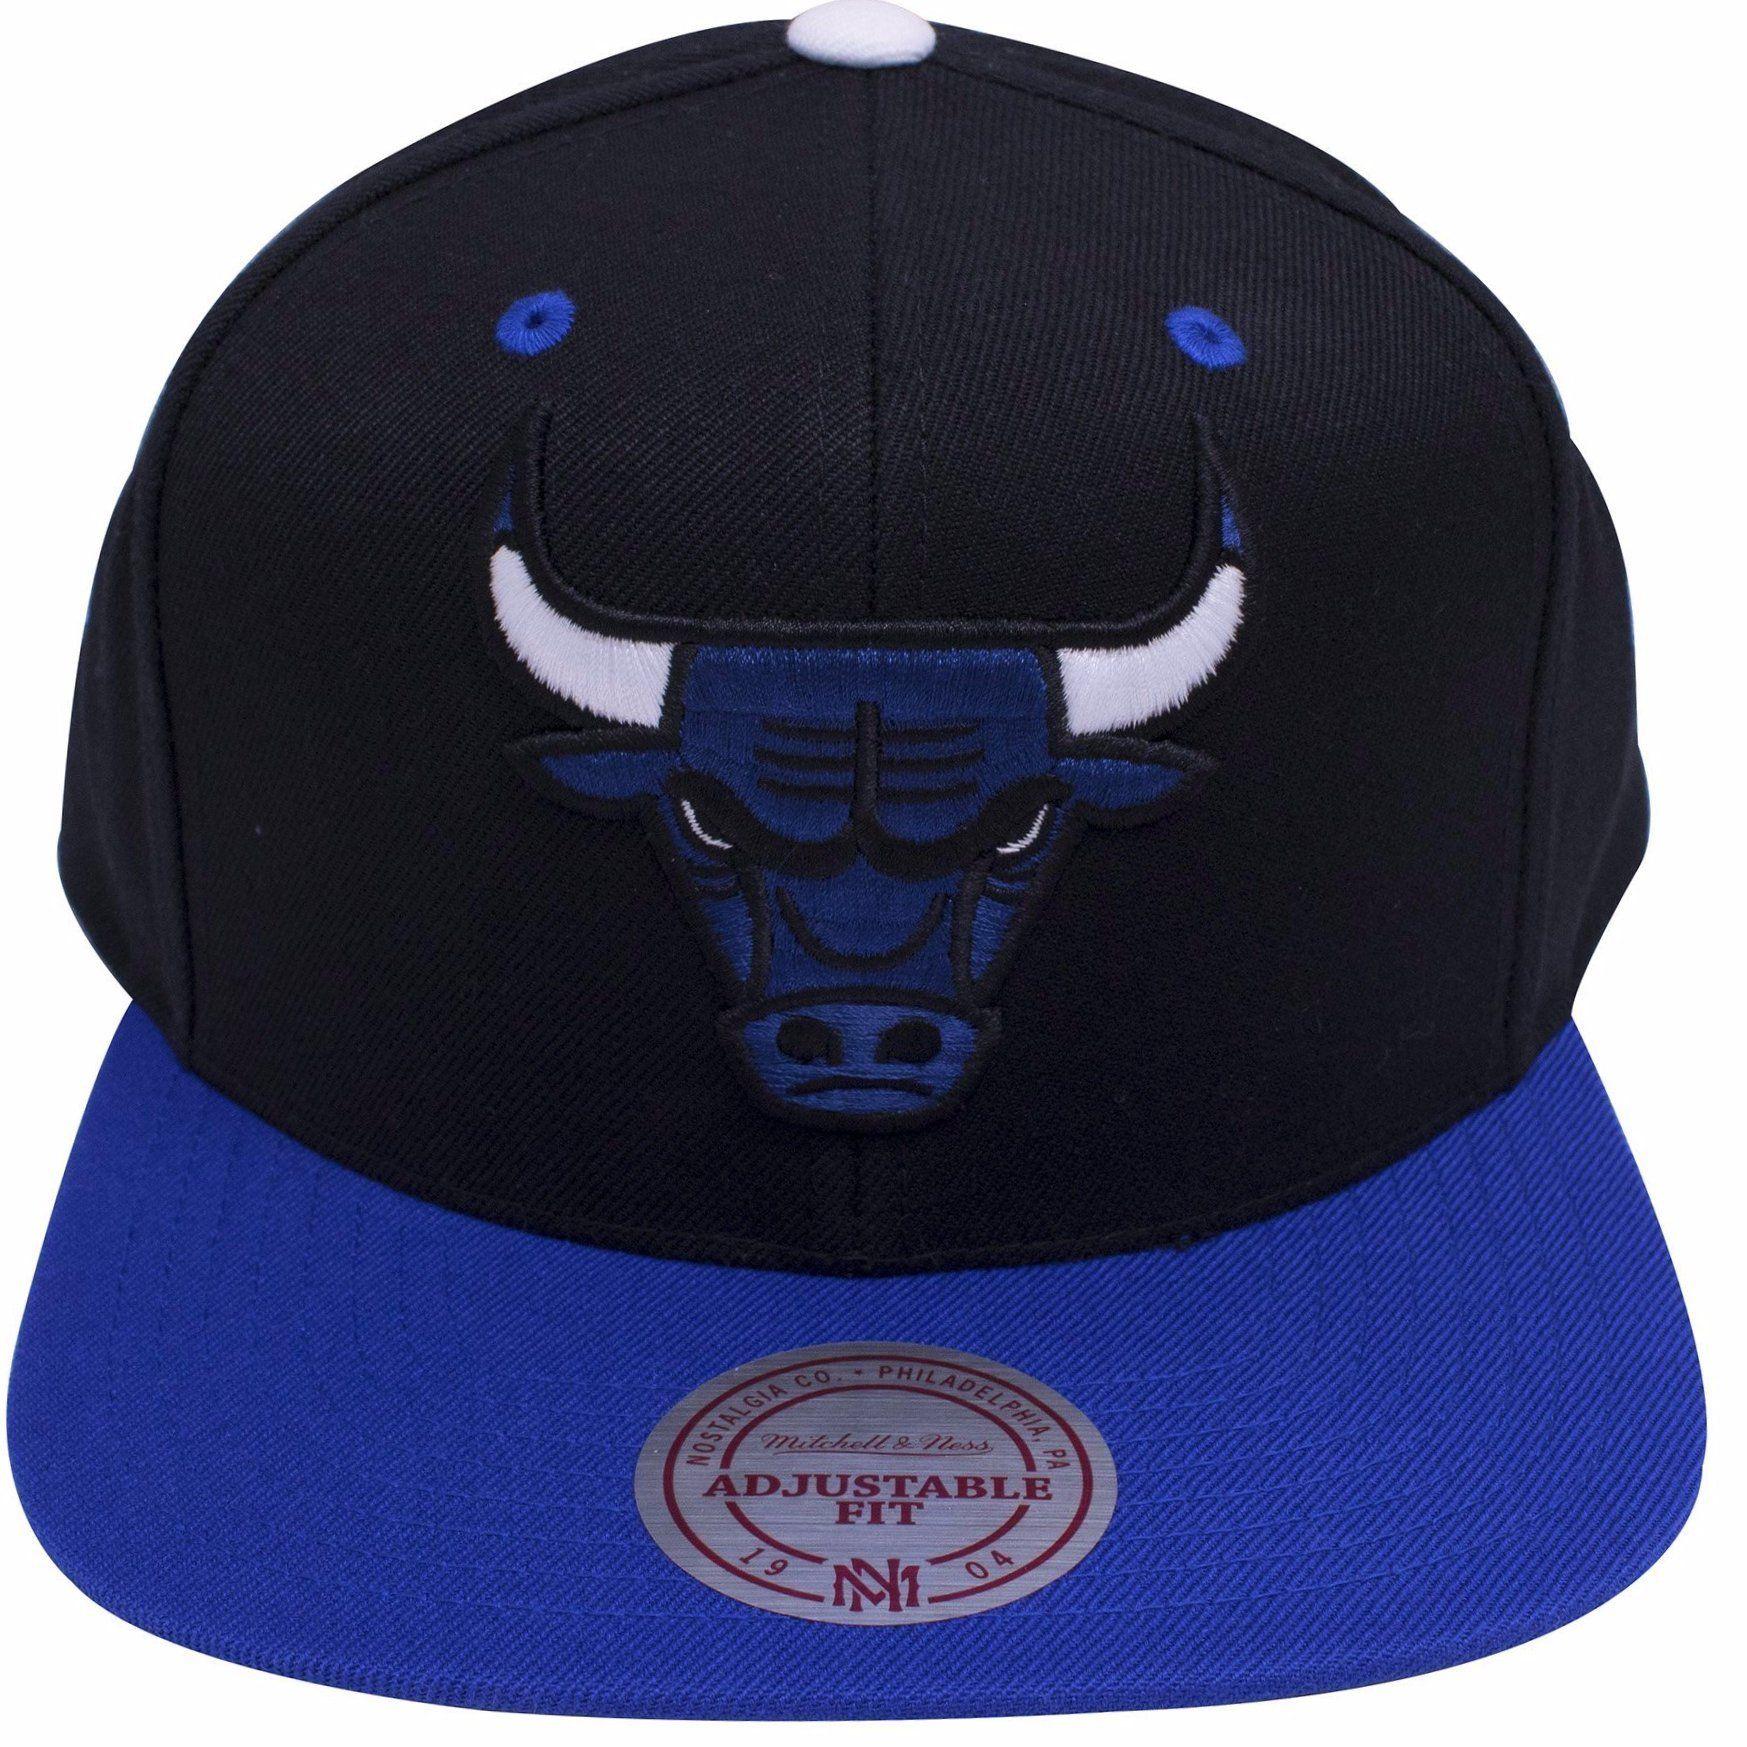 9d066ed61cc4a7 Chicago Bulls Retro Air Jordan 4 Game Royal Sneaker Matching Snapback Hat